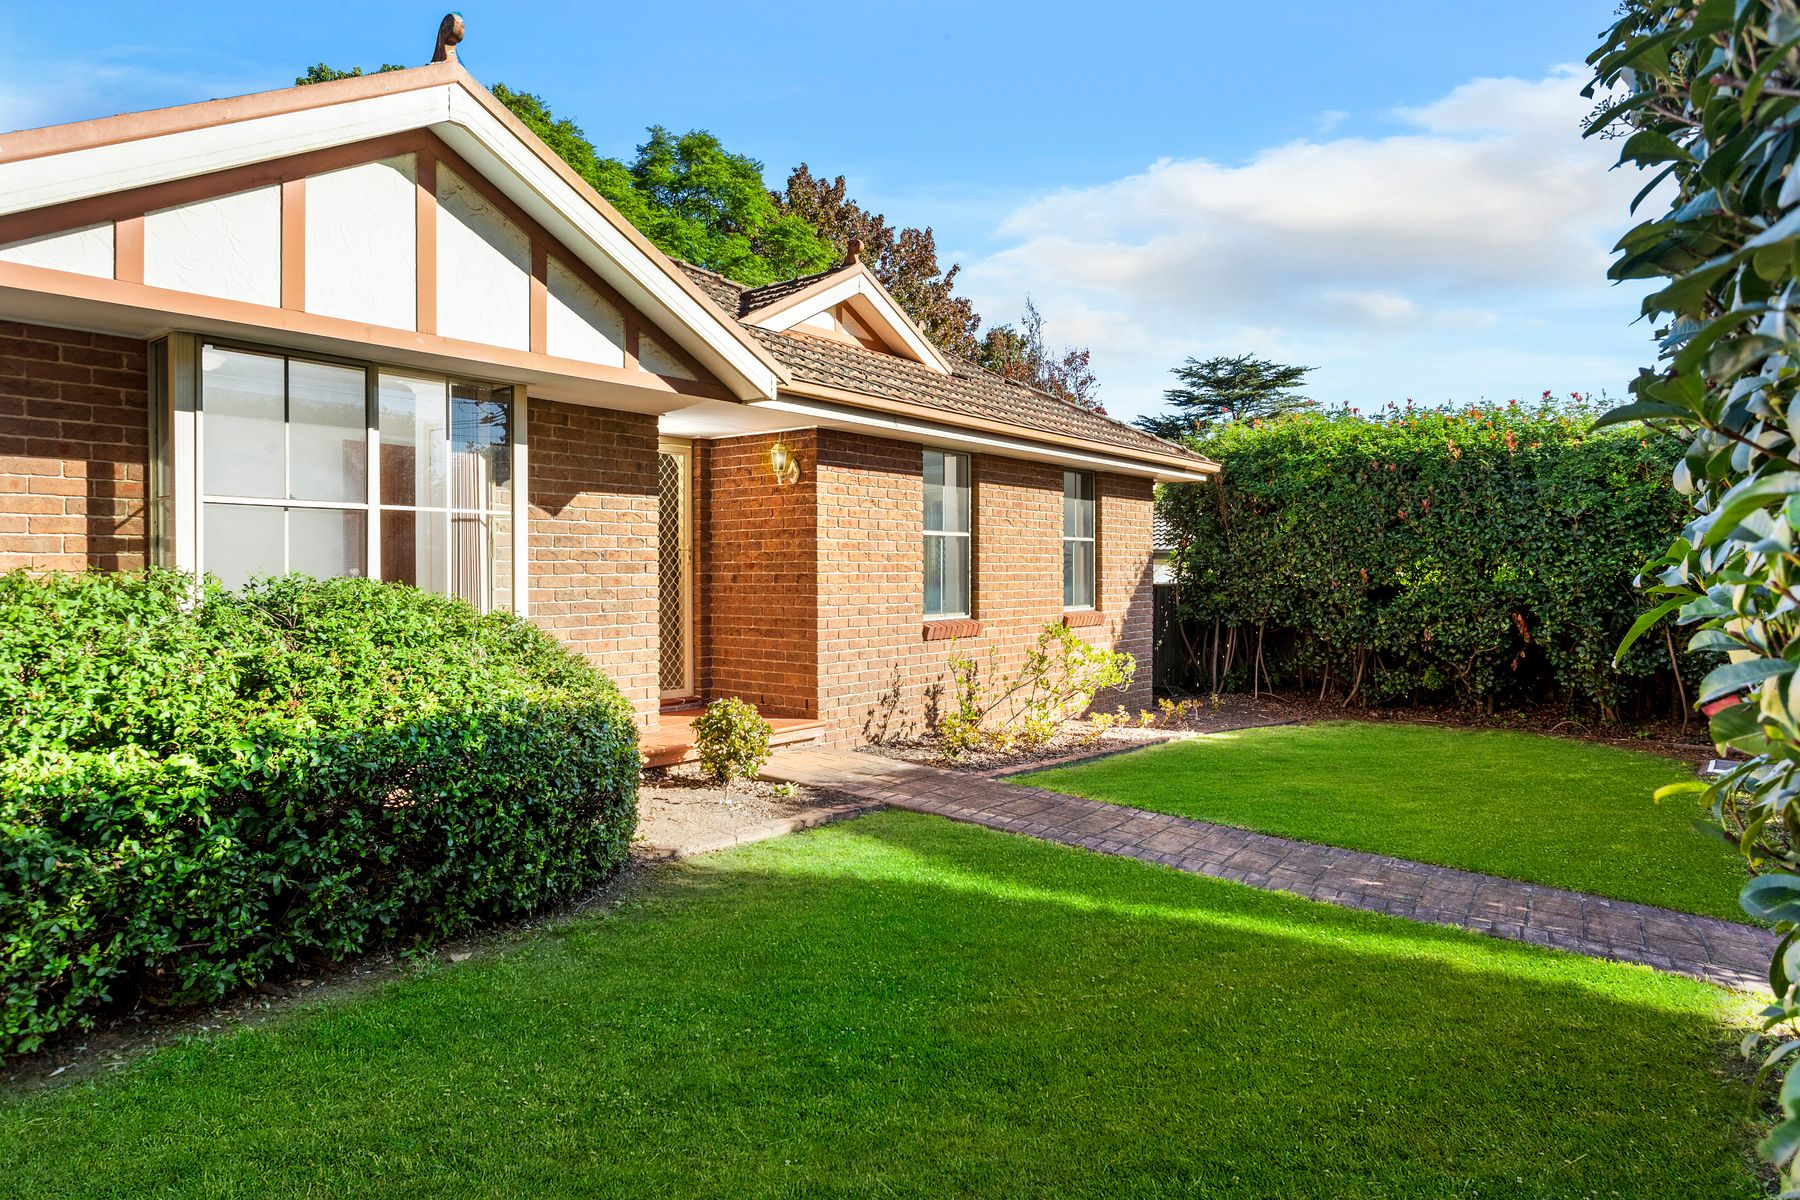 6/1-3 Balaclava Road, Eastwood, NSW 2122